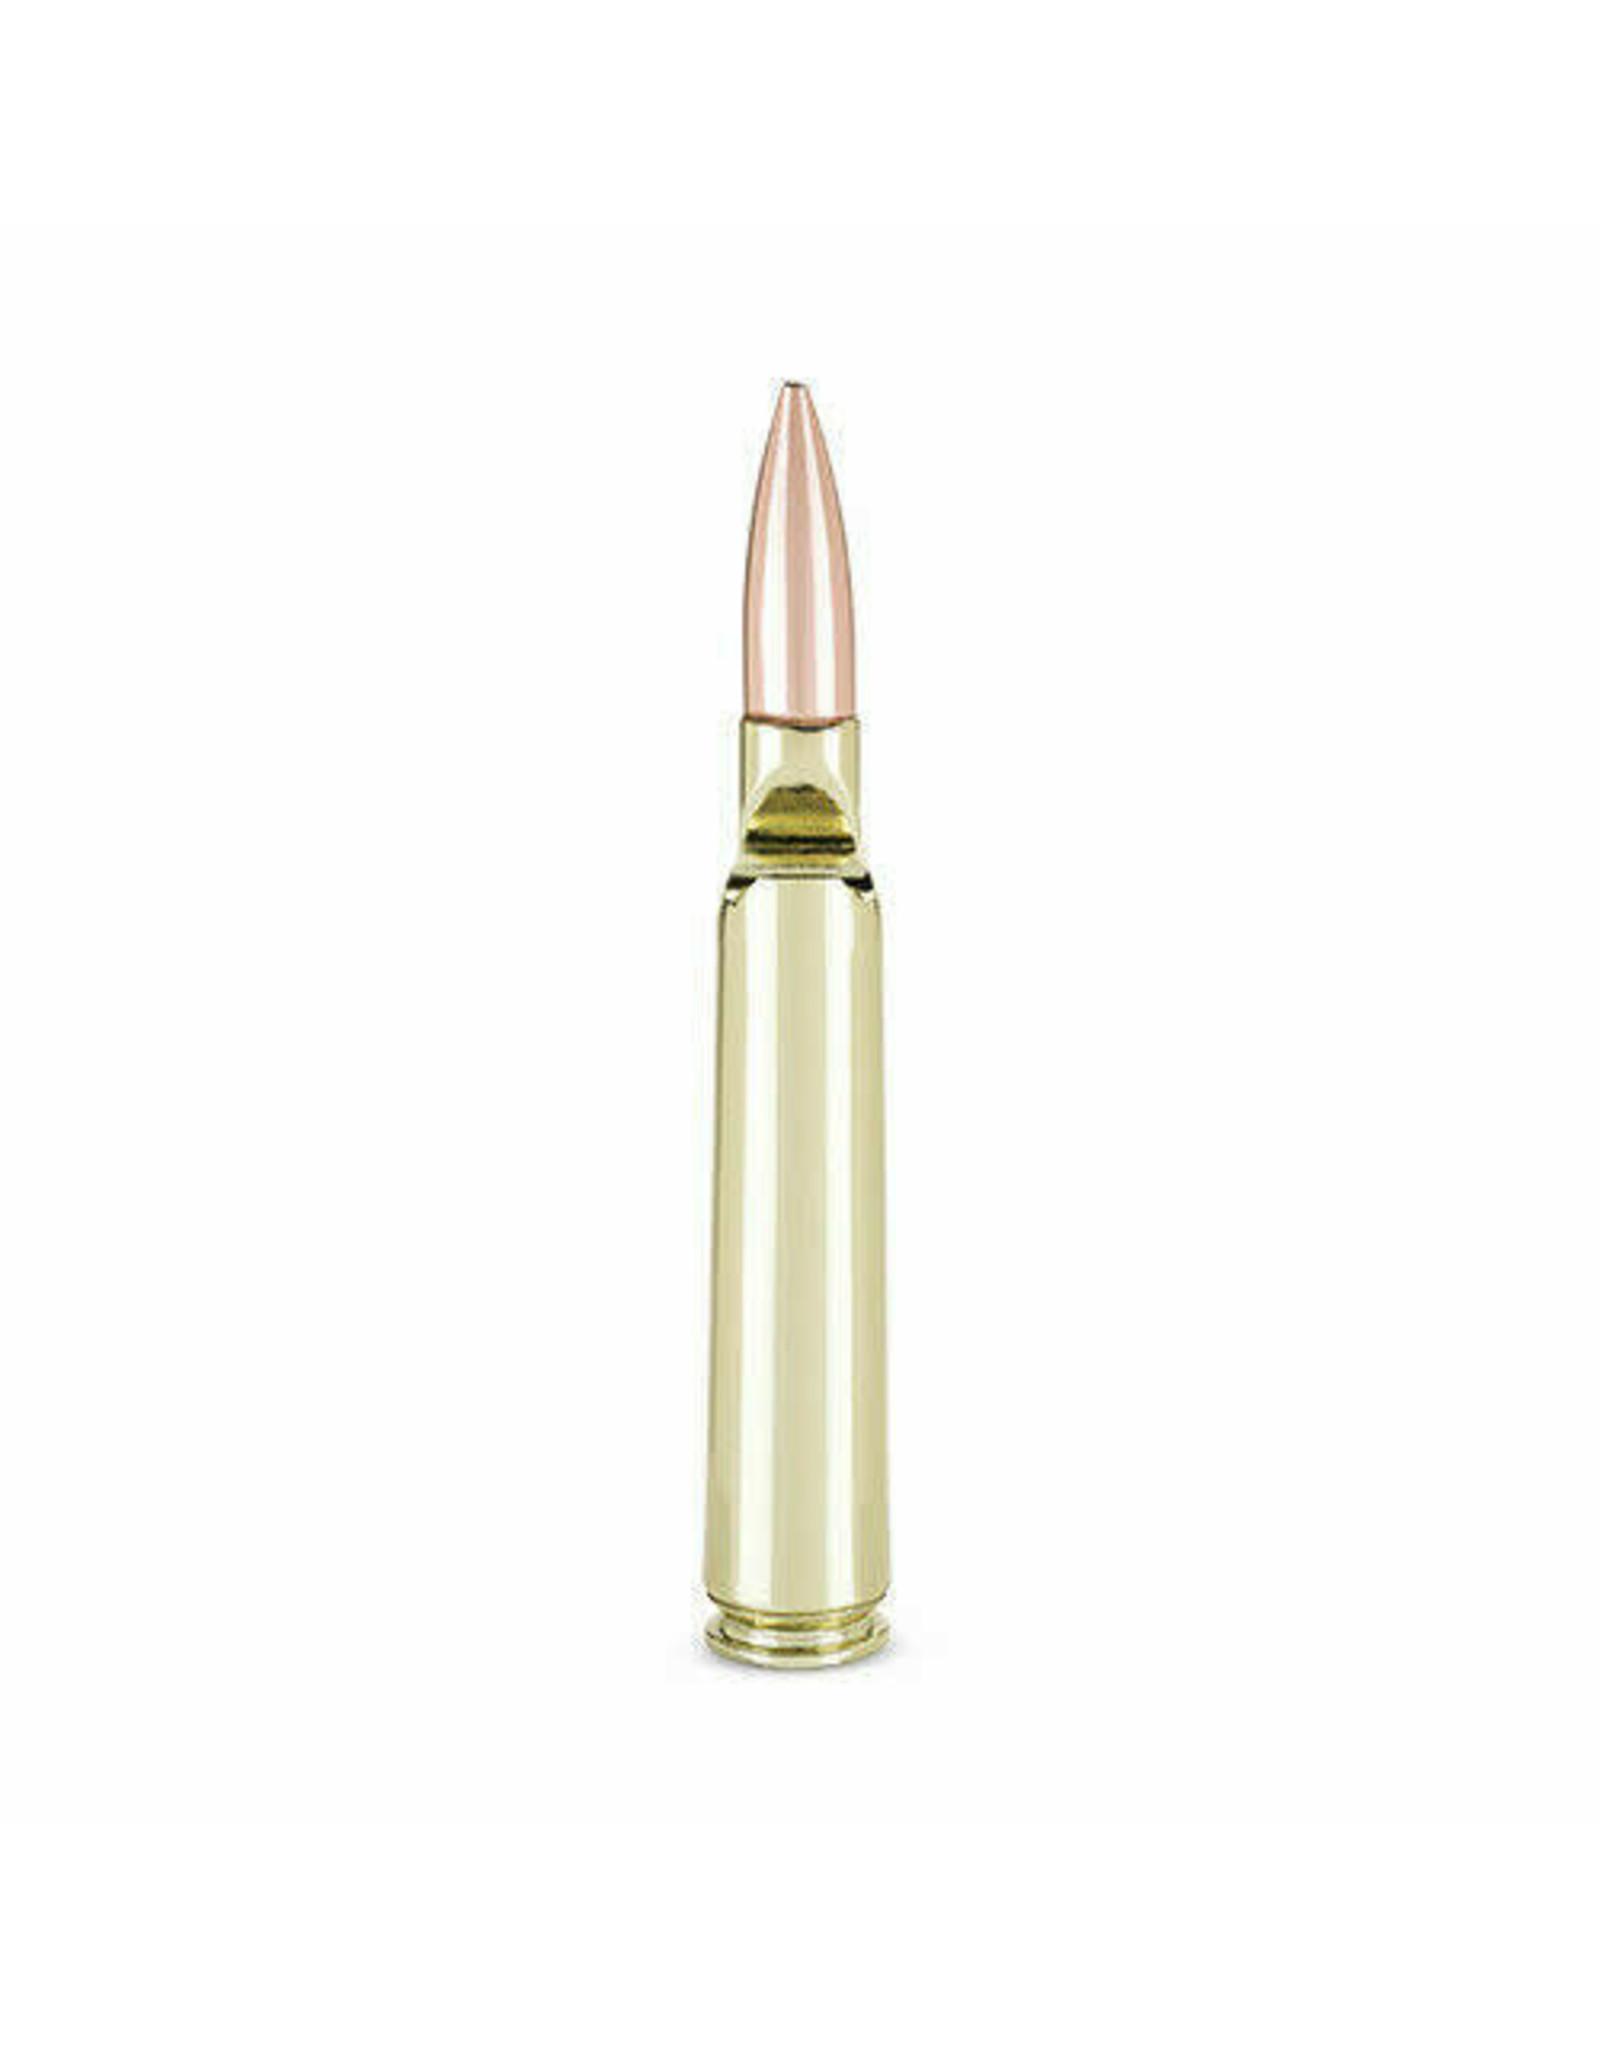 True Gold Bullet Bottle Opnr